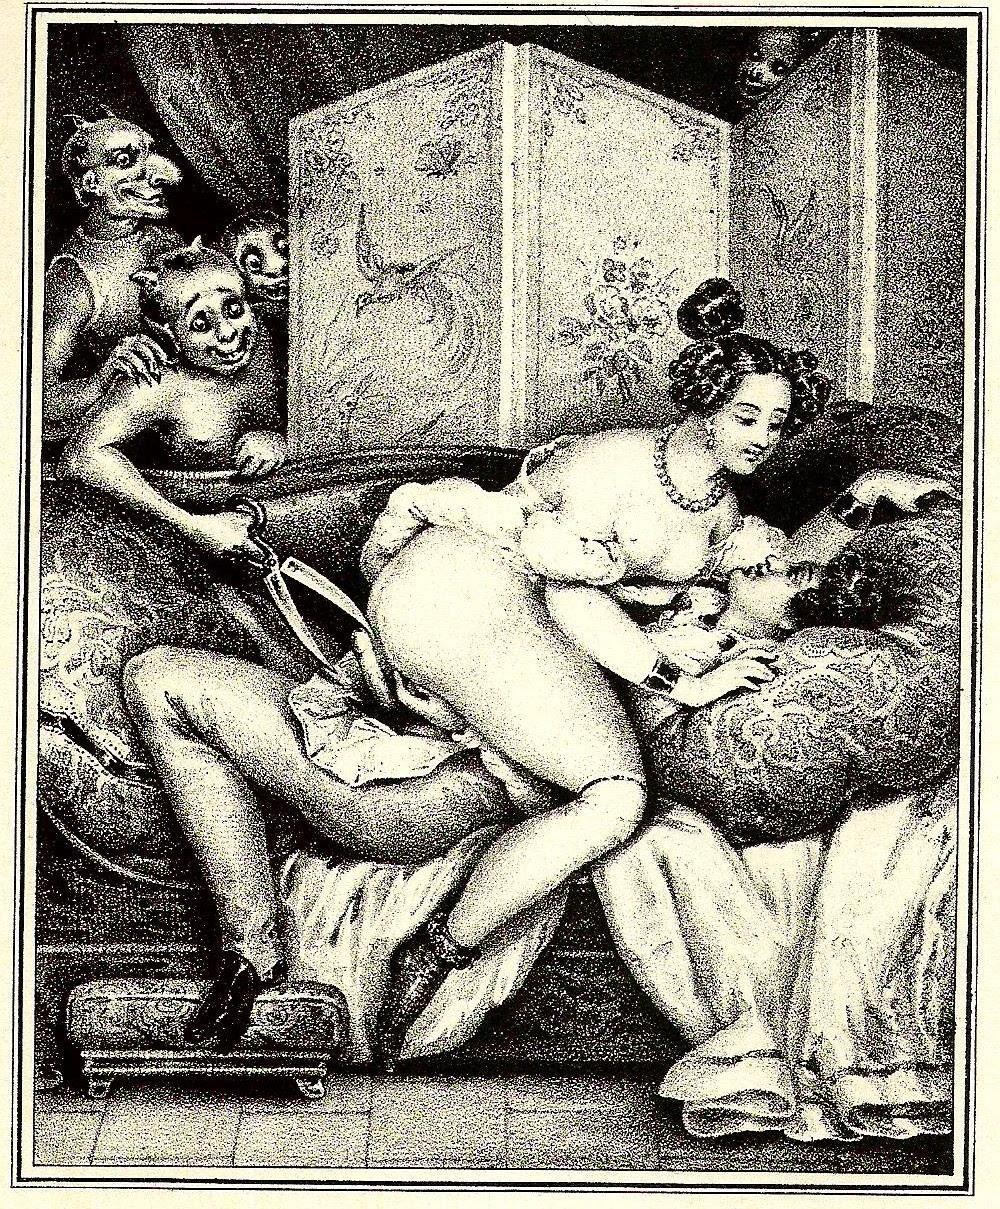 eroticheskoe-foto-dari-sagalovoy